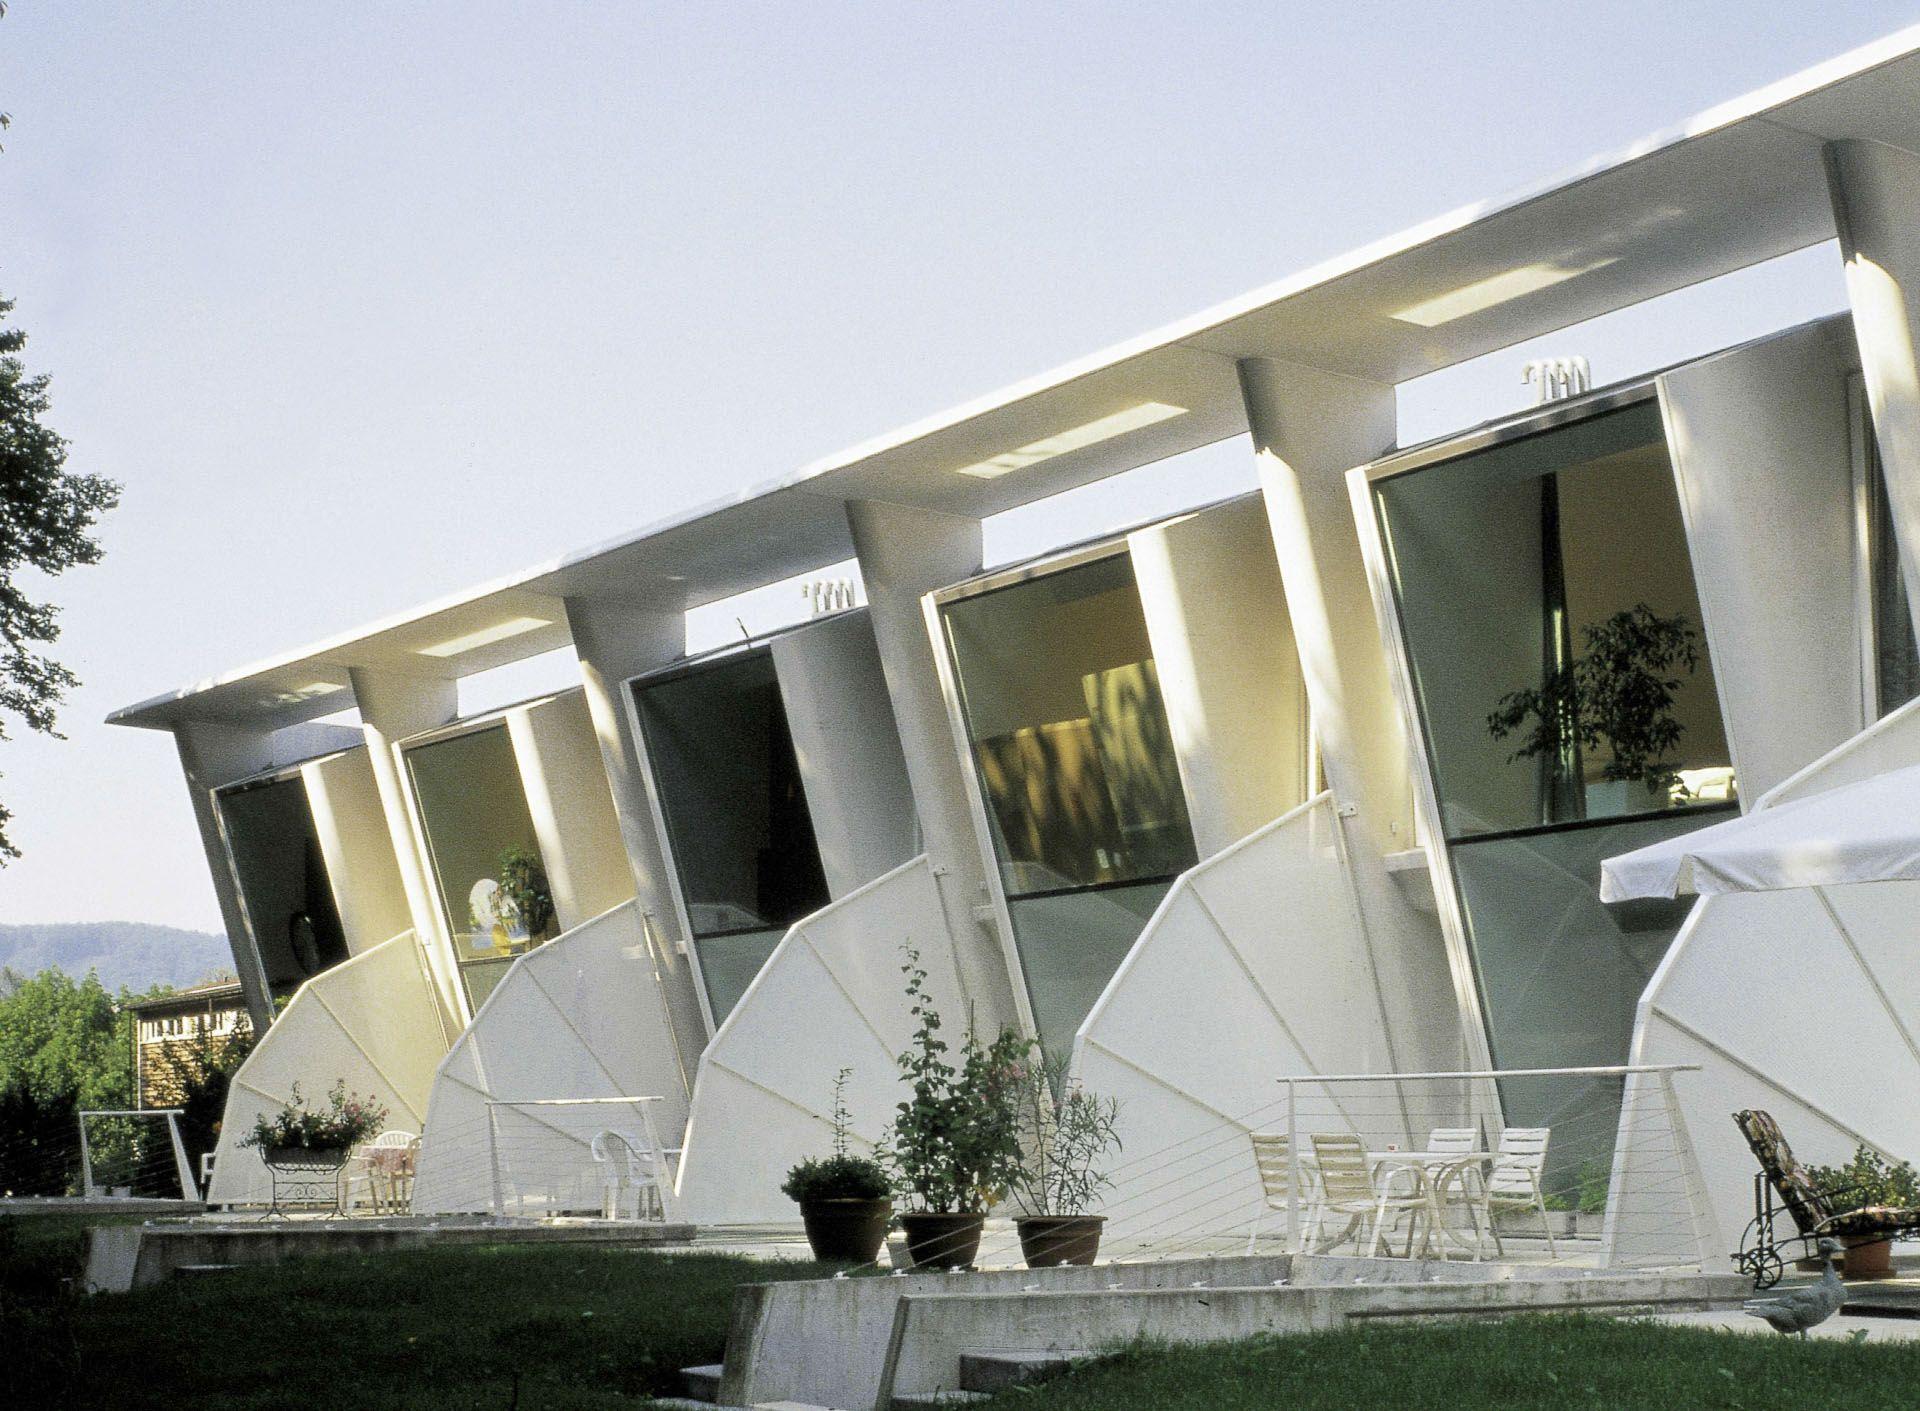 Buchen Housing Estate / Würenlingen (Gallery) - Santiago Calatrava – Architects & Engineers